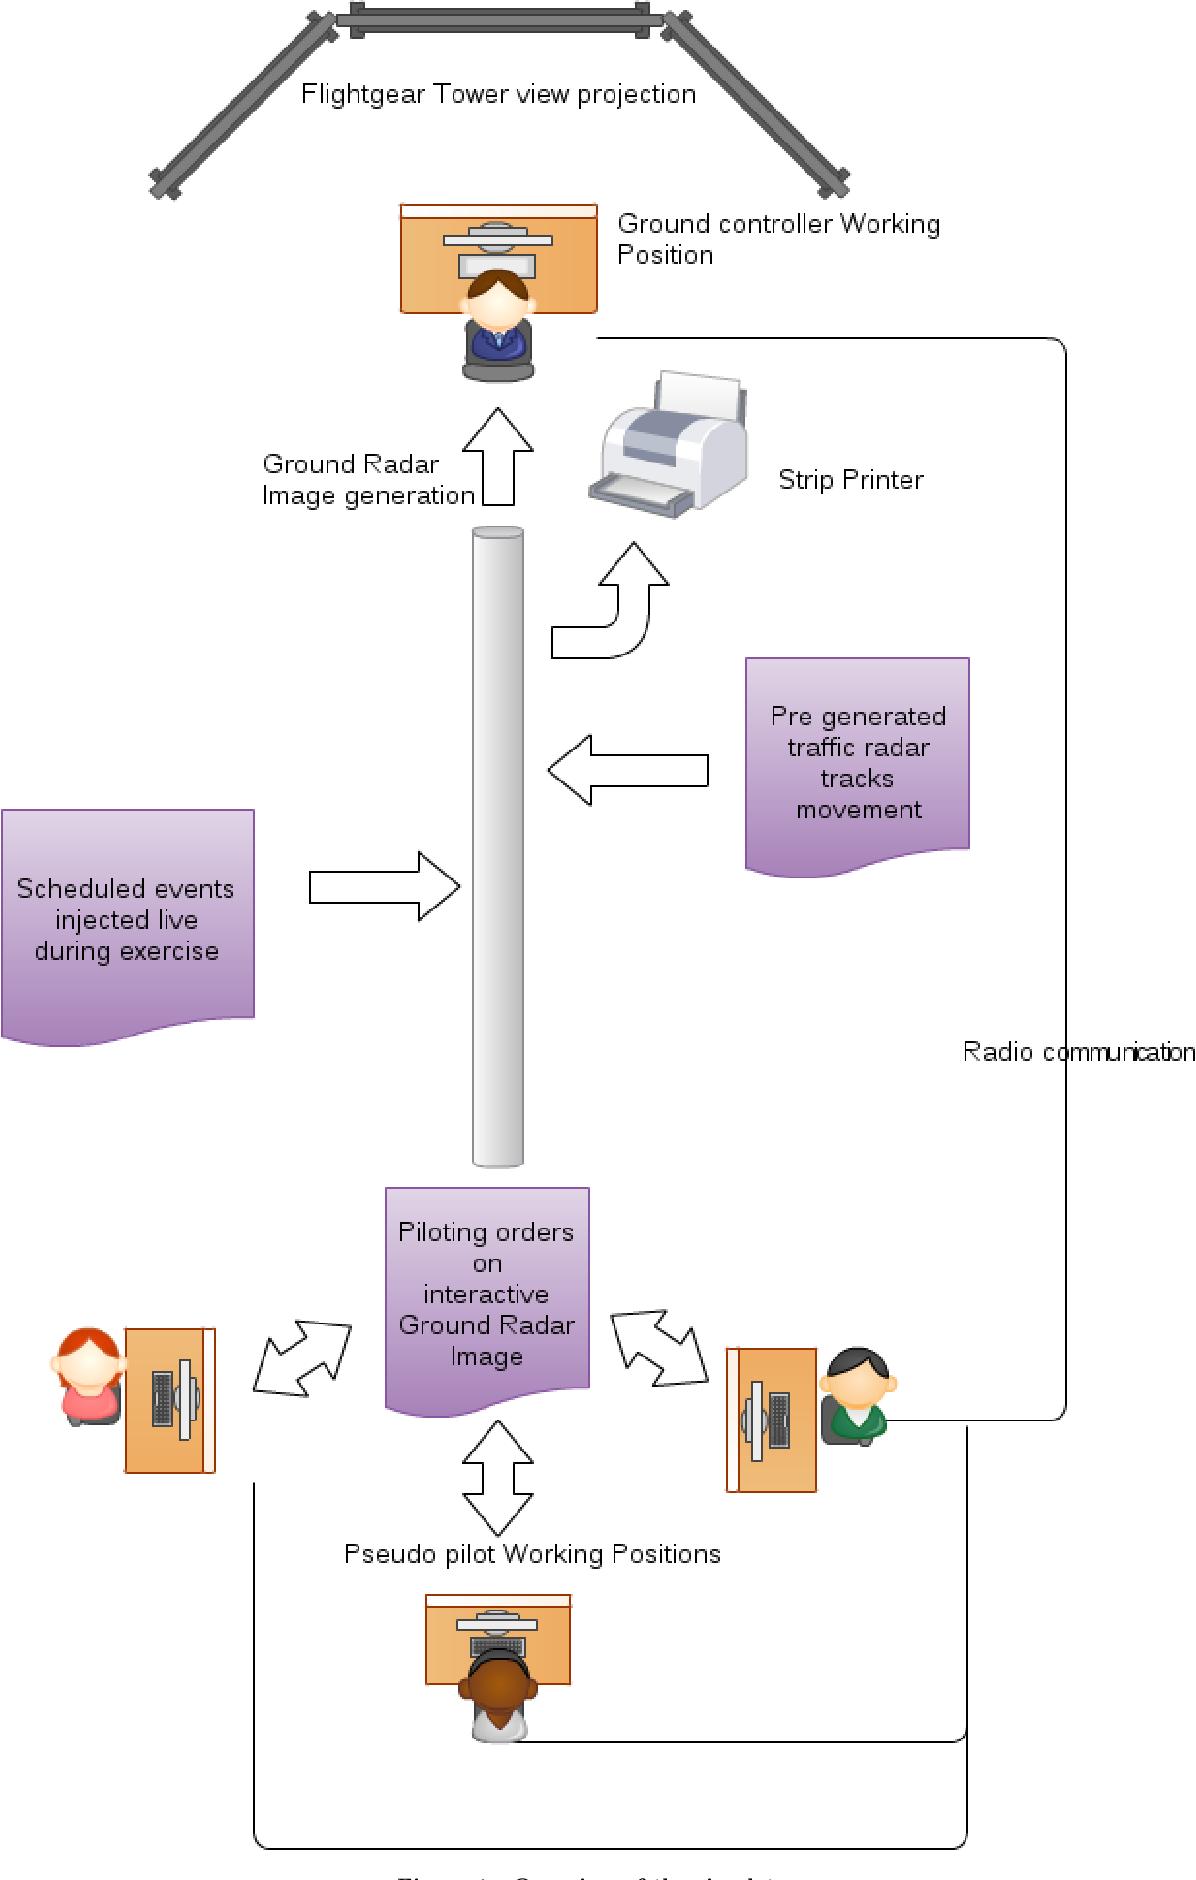 PDF] Development of an ATC Tower Simulator to Simulate Ground